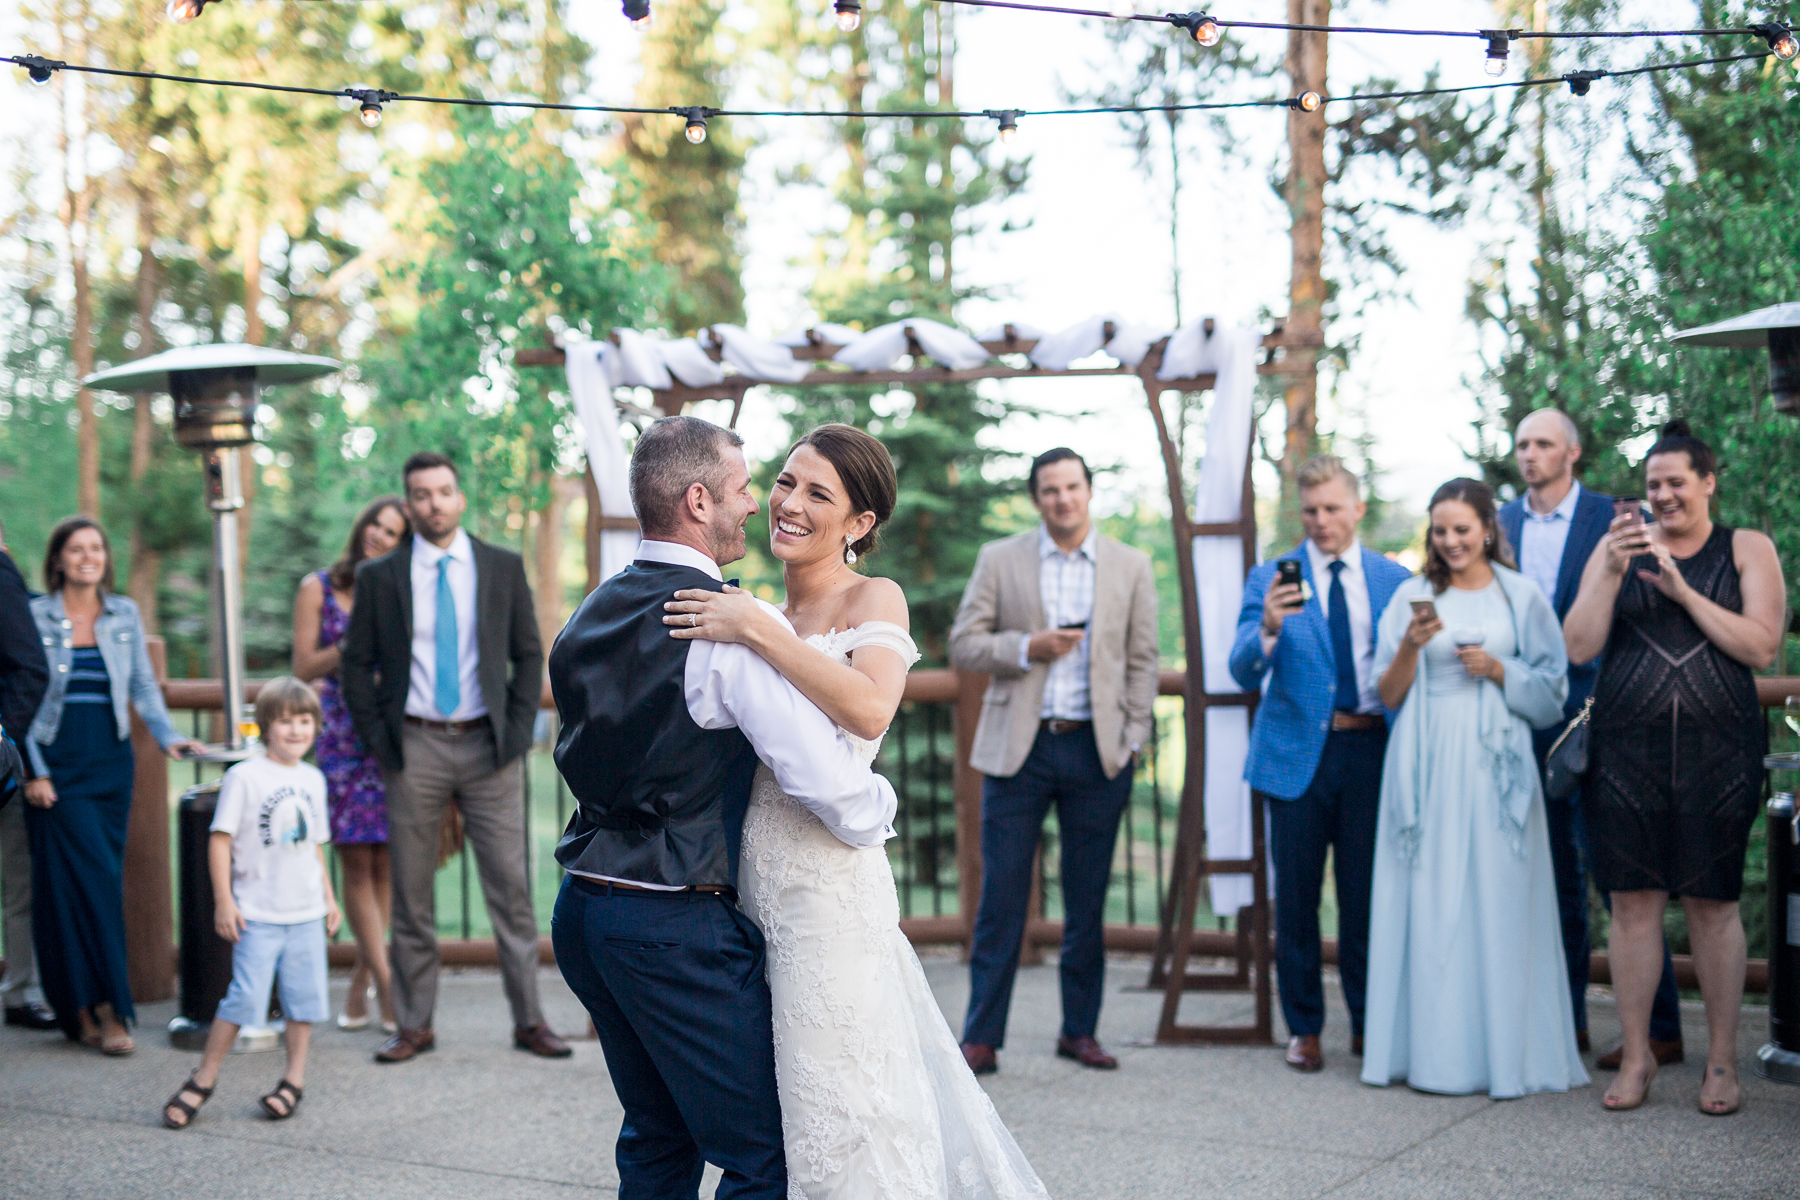 StaciDesign-Colorado-Wedding-5596.jpg